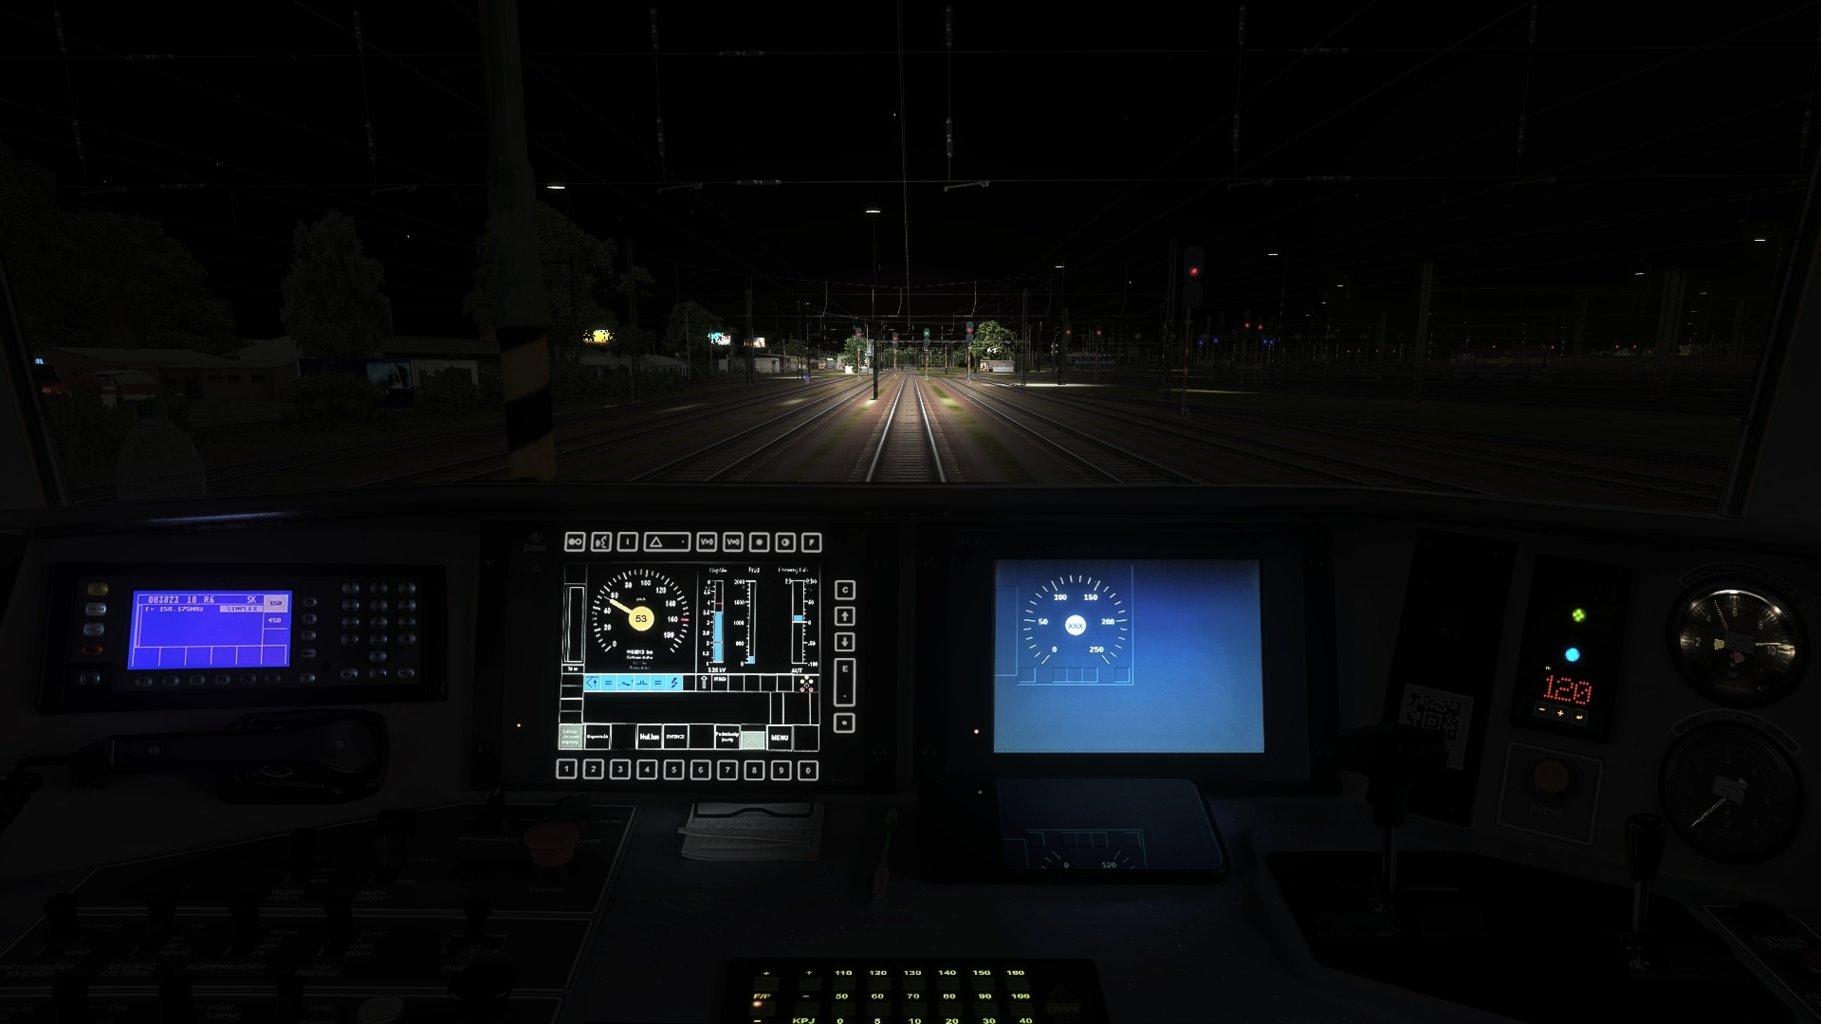 cab671_NIGHT.jpg